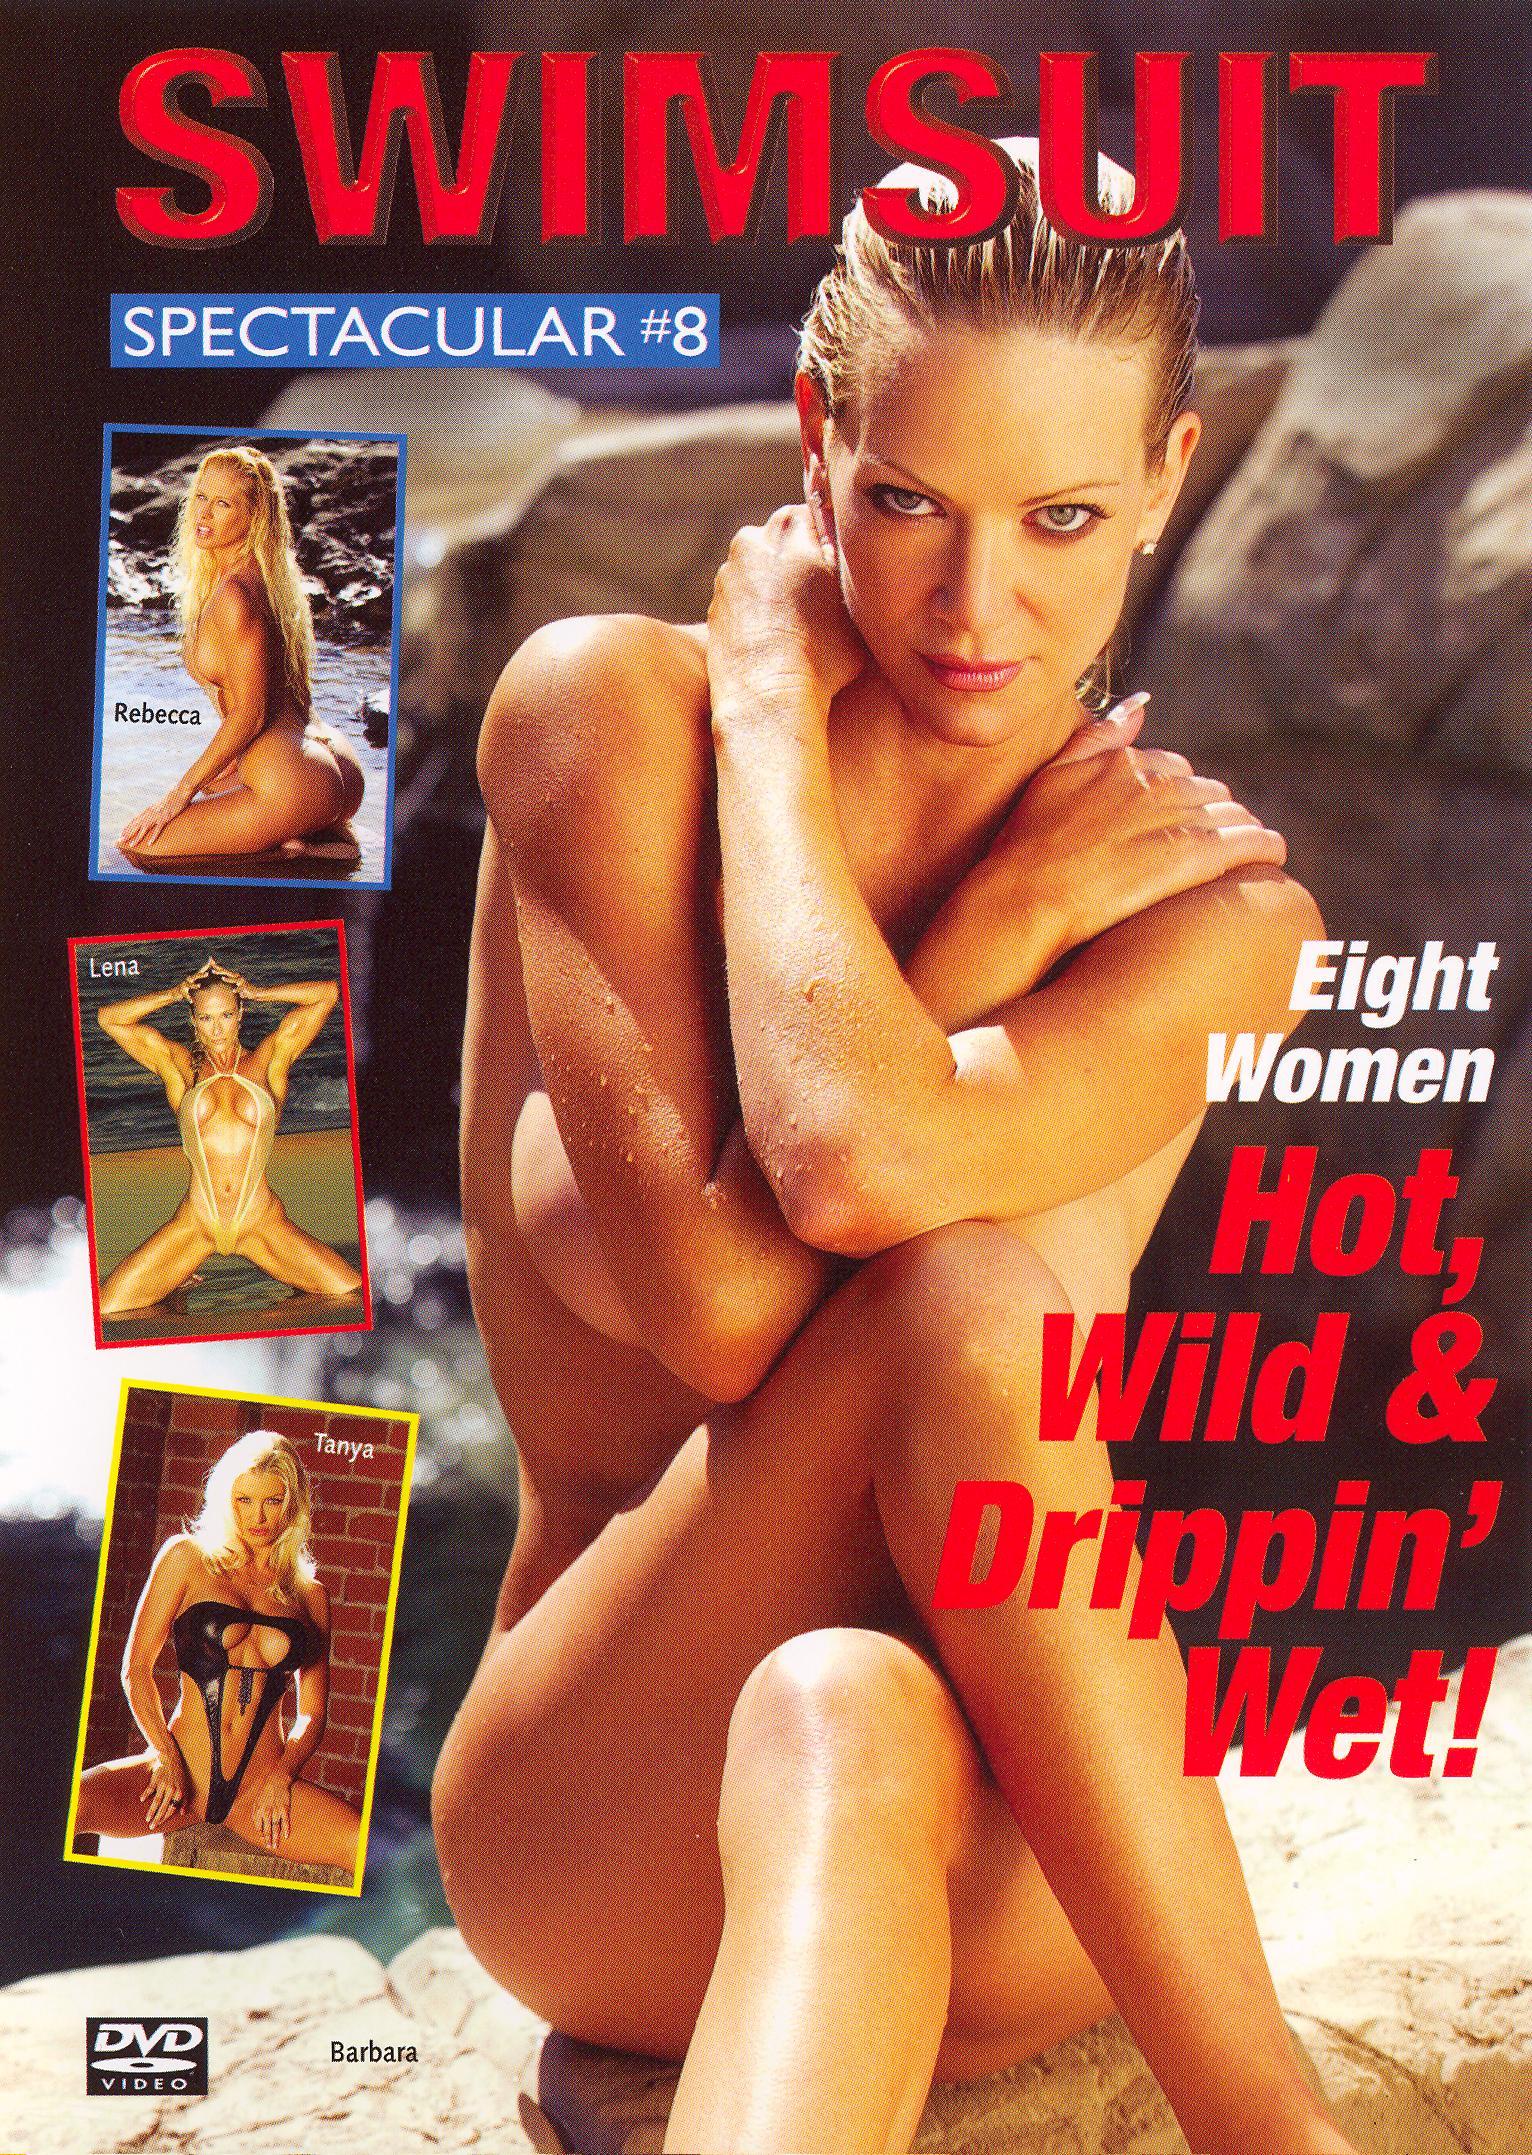 Iron Man Magazine Presents: Swimsuit Spectacular, Vol. 8